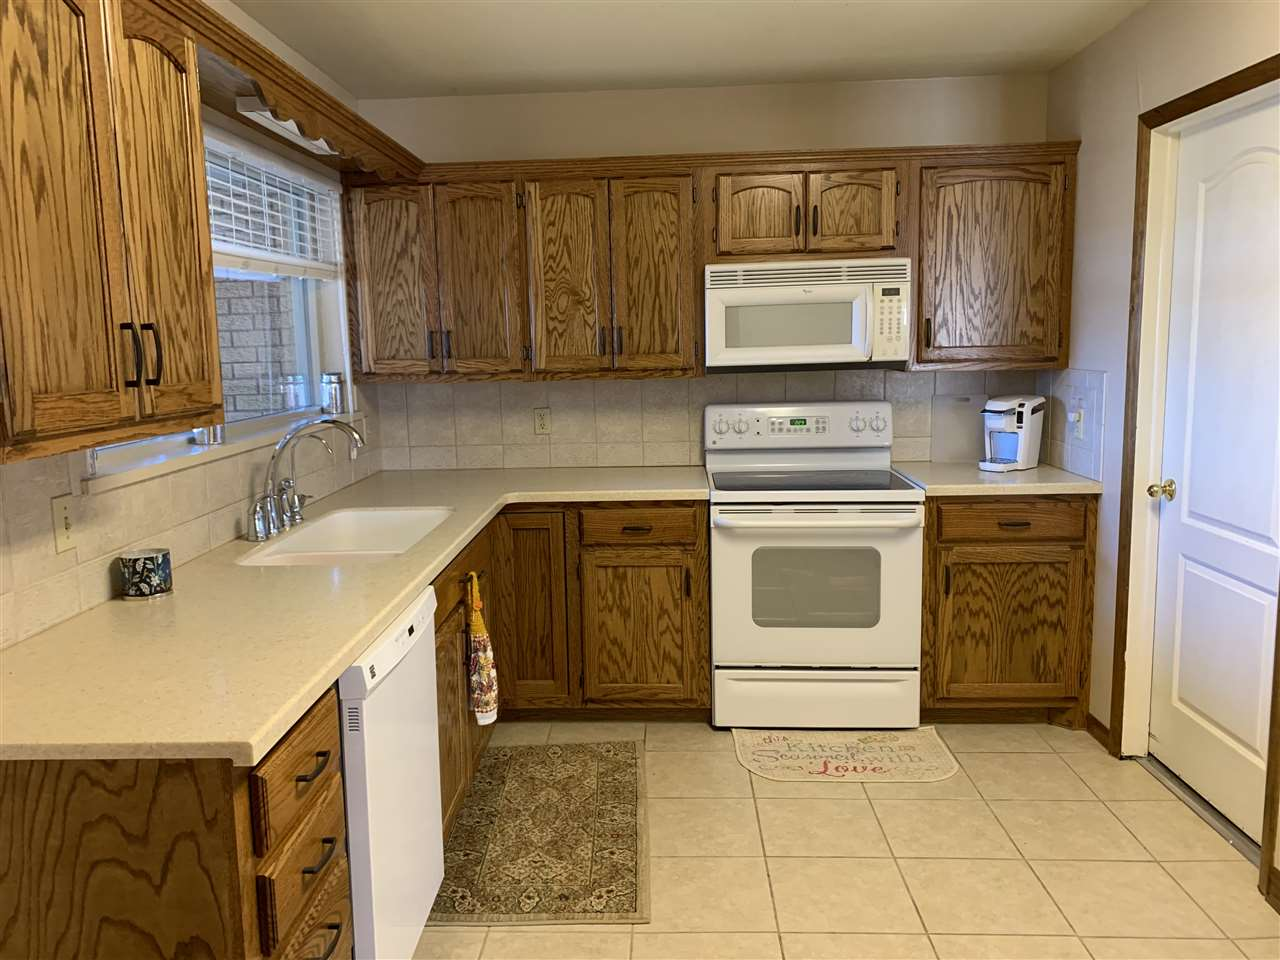 Sold Intraoffice W/MLS   114 S Peach Newkirk, OK 74647 9